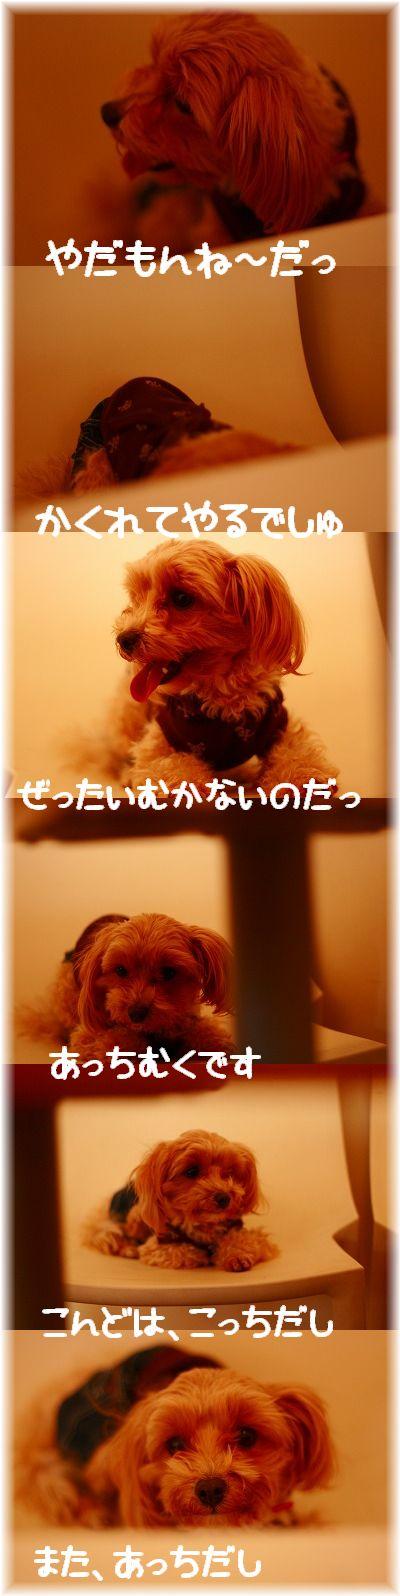 IMG_25661.jpg